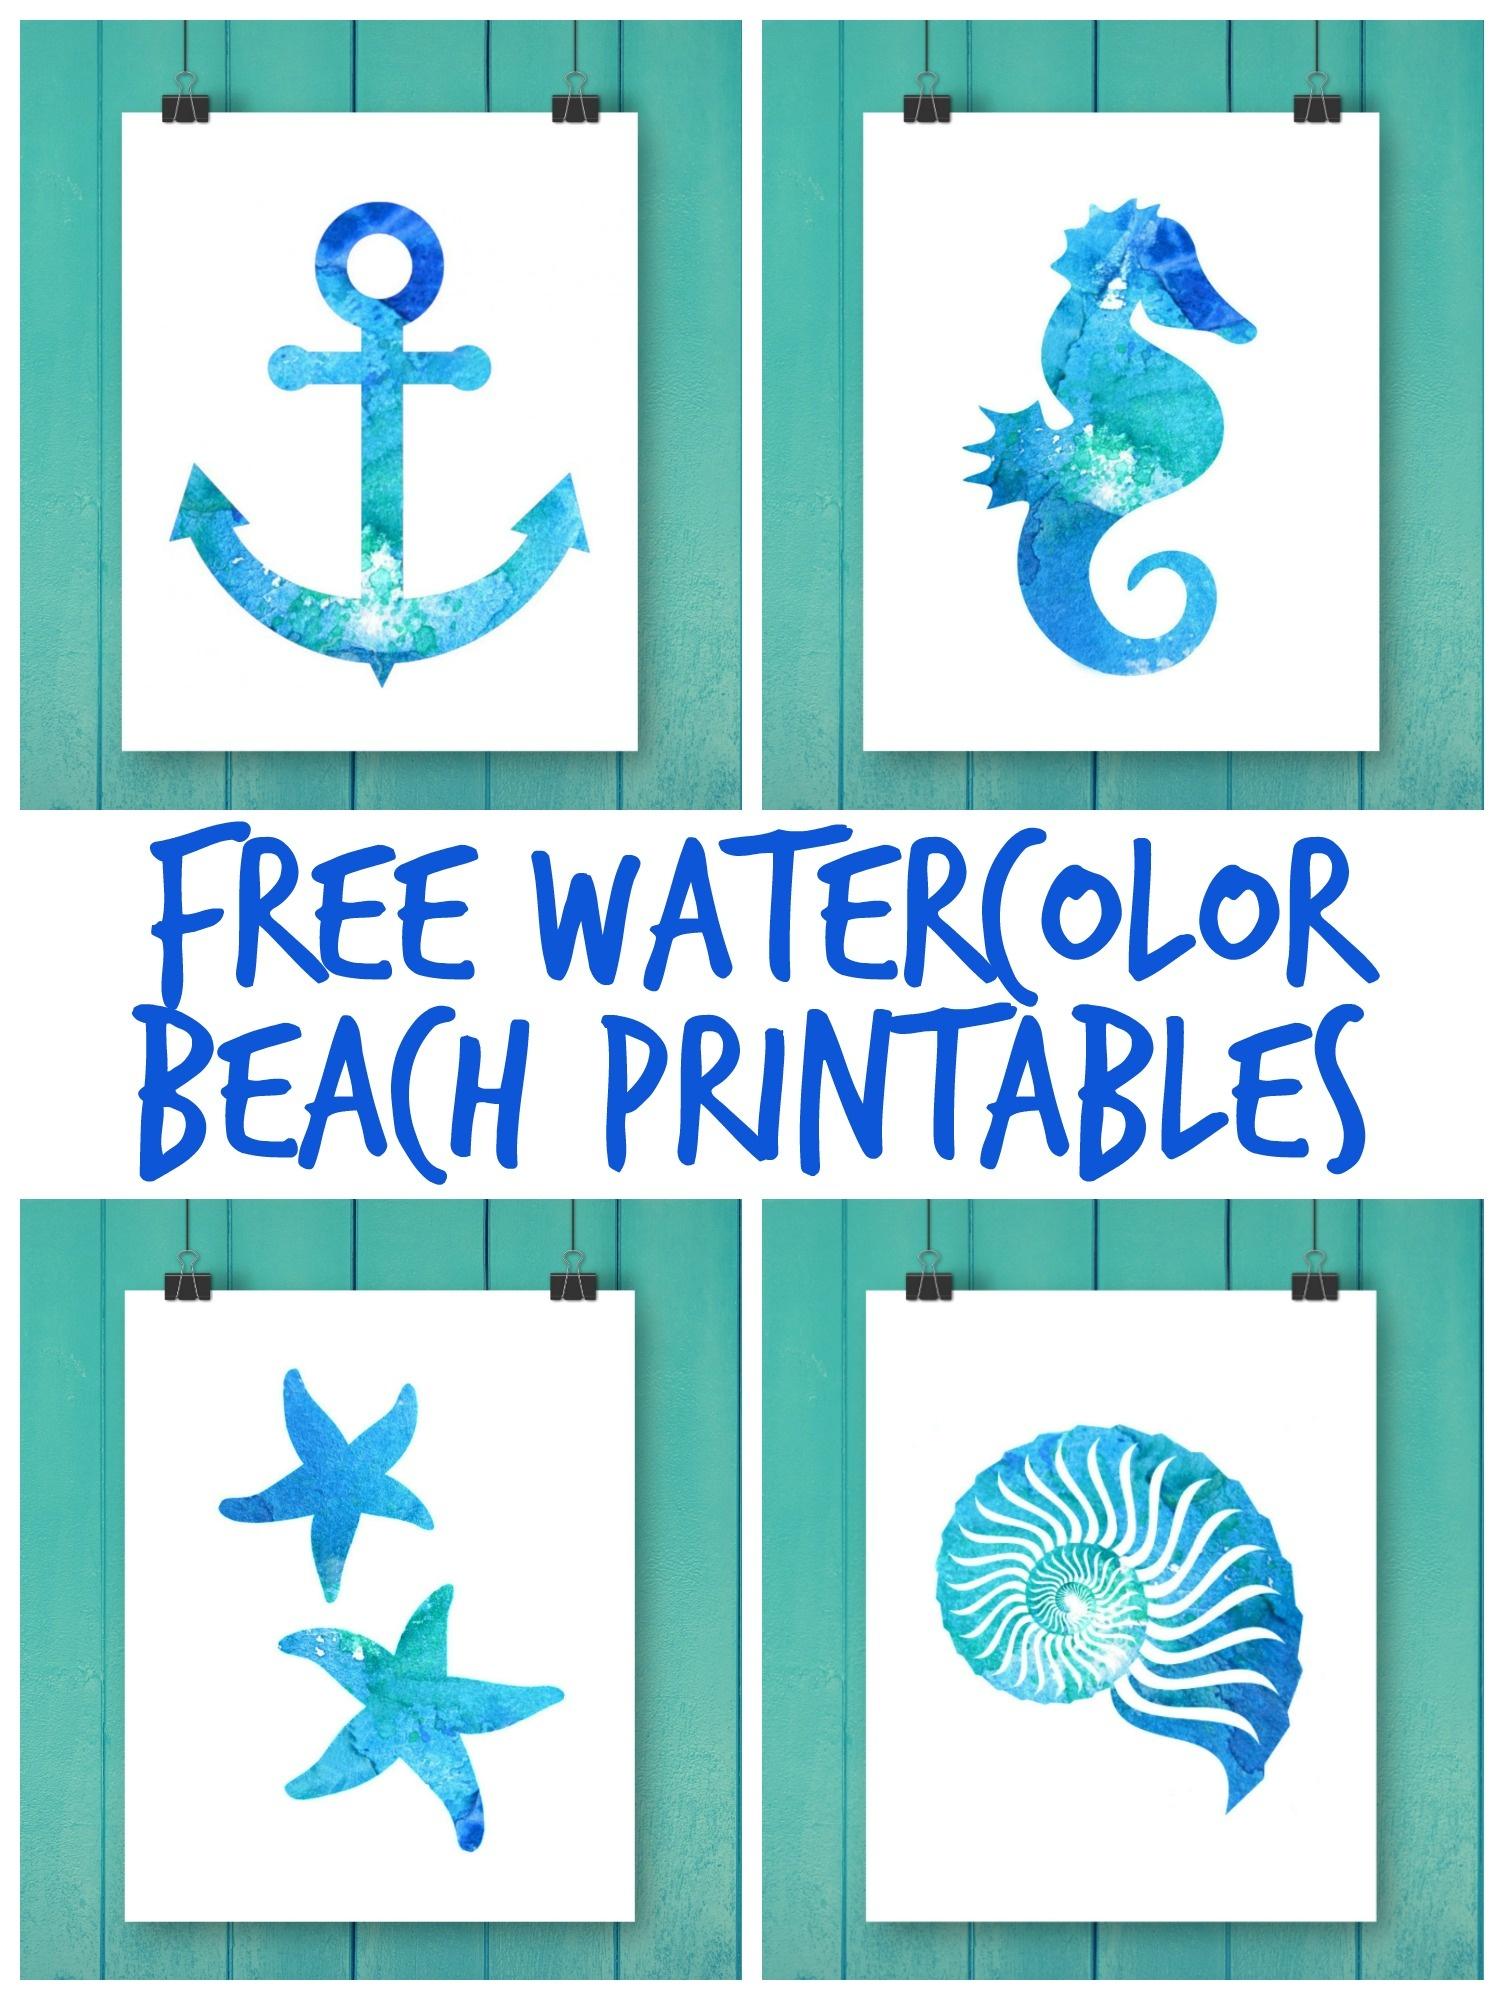 Free Watercolor Beach Printables - Free Watercolor Printables